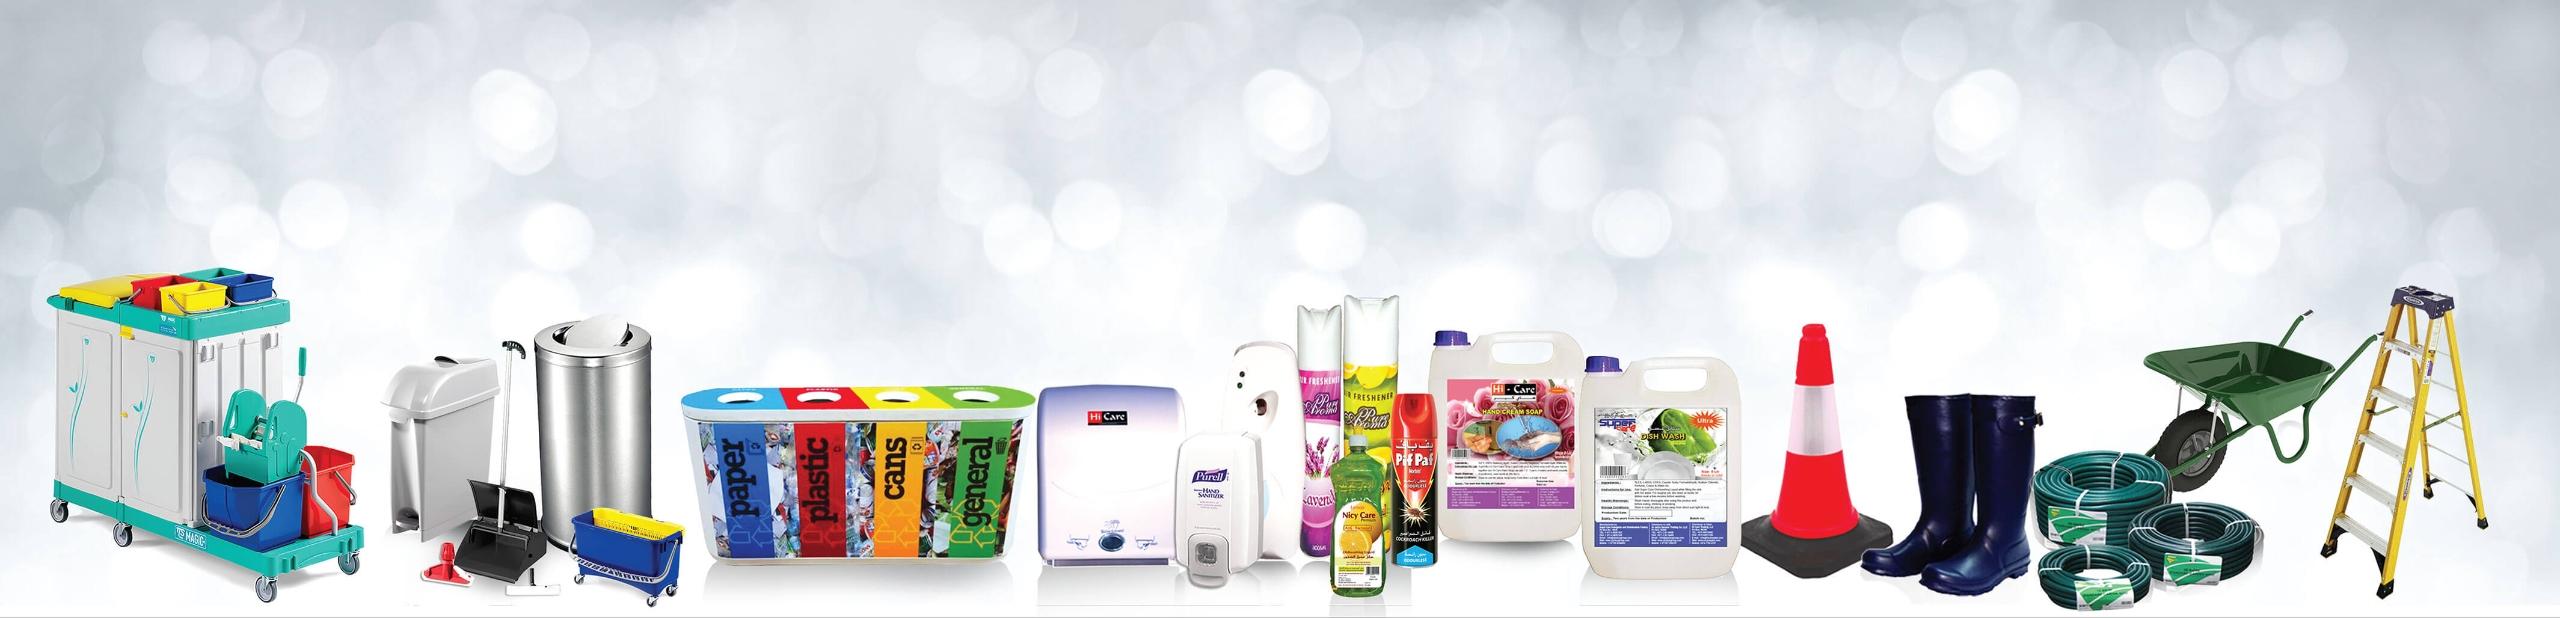 Hi-Care Hygiene Solutions (@hicareqatar) Cover Image